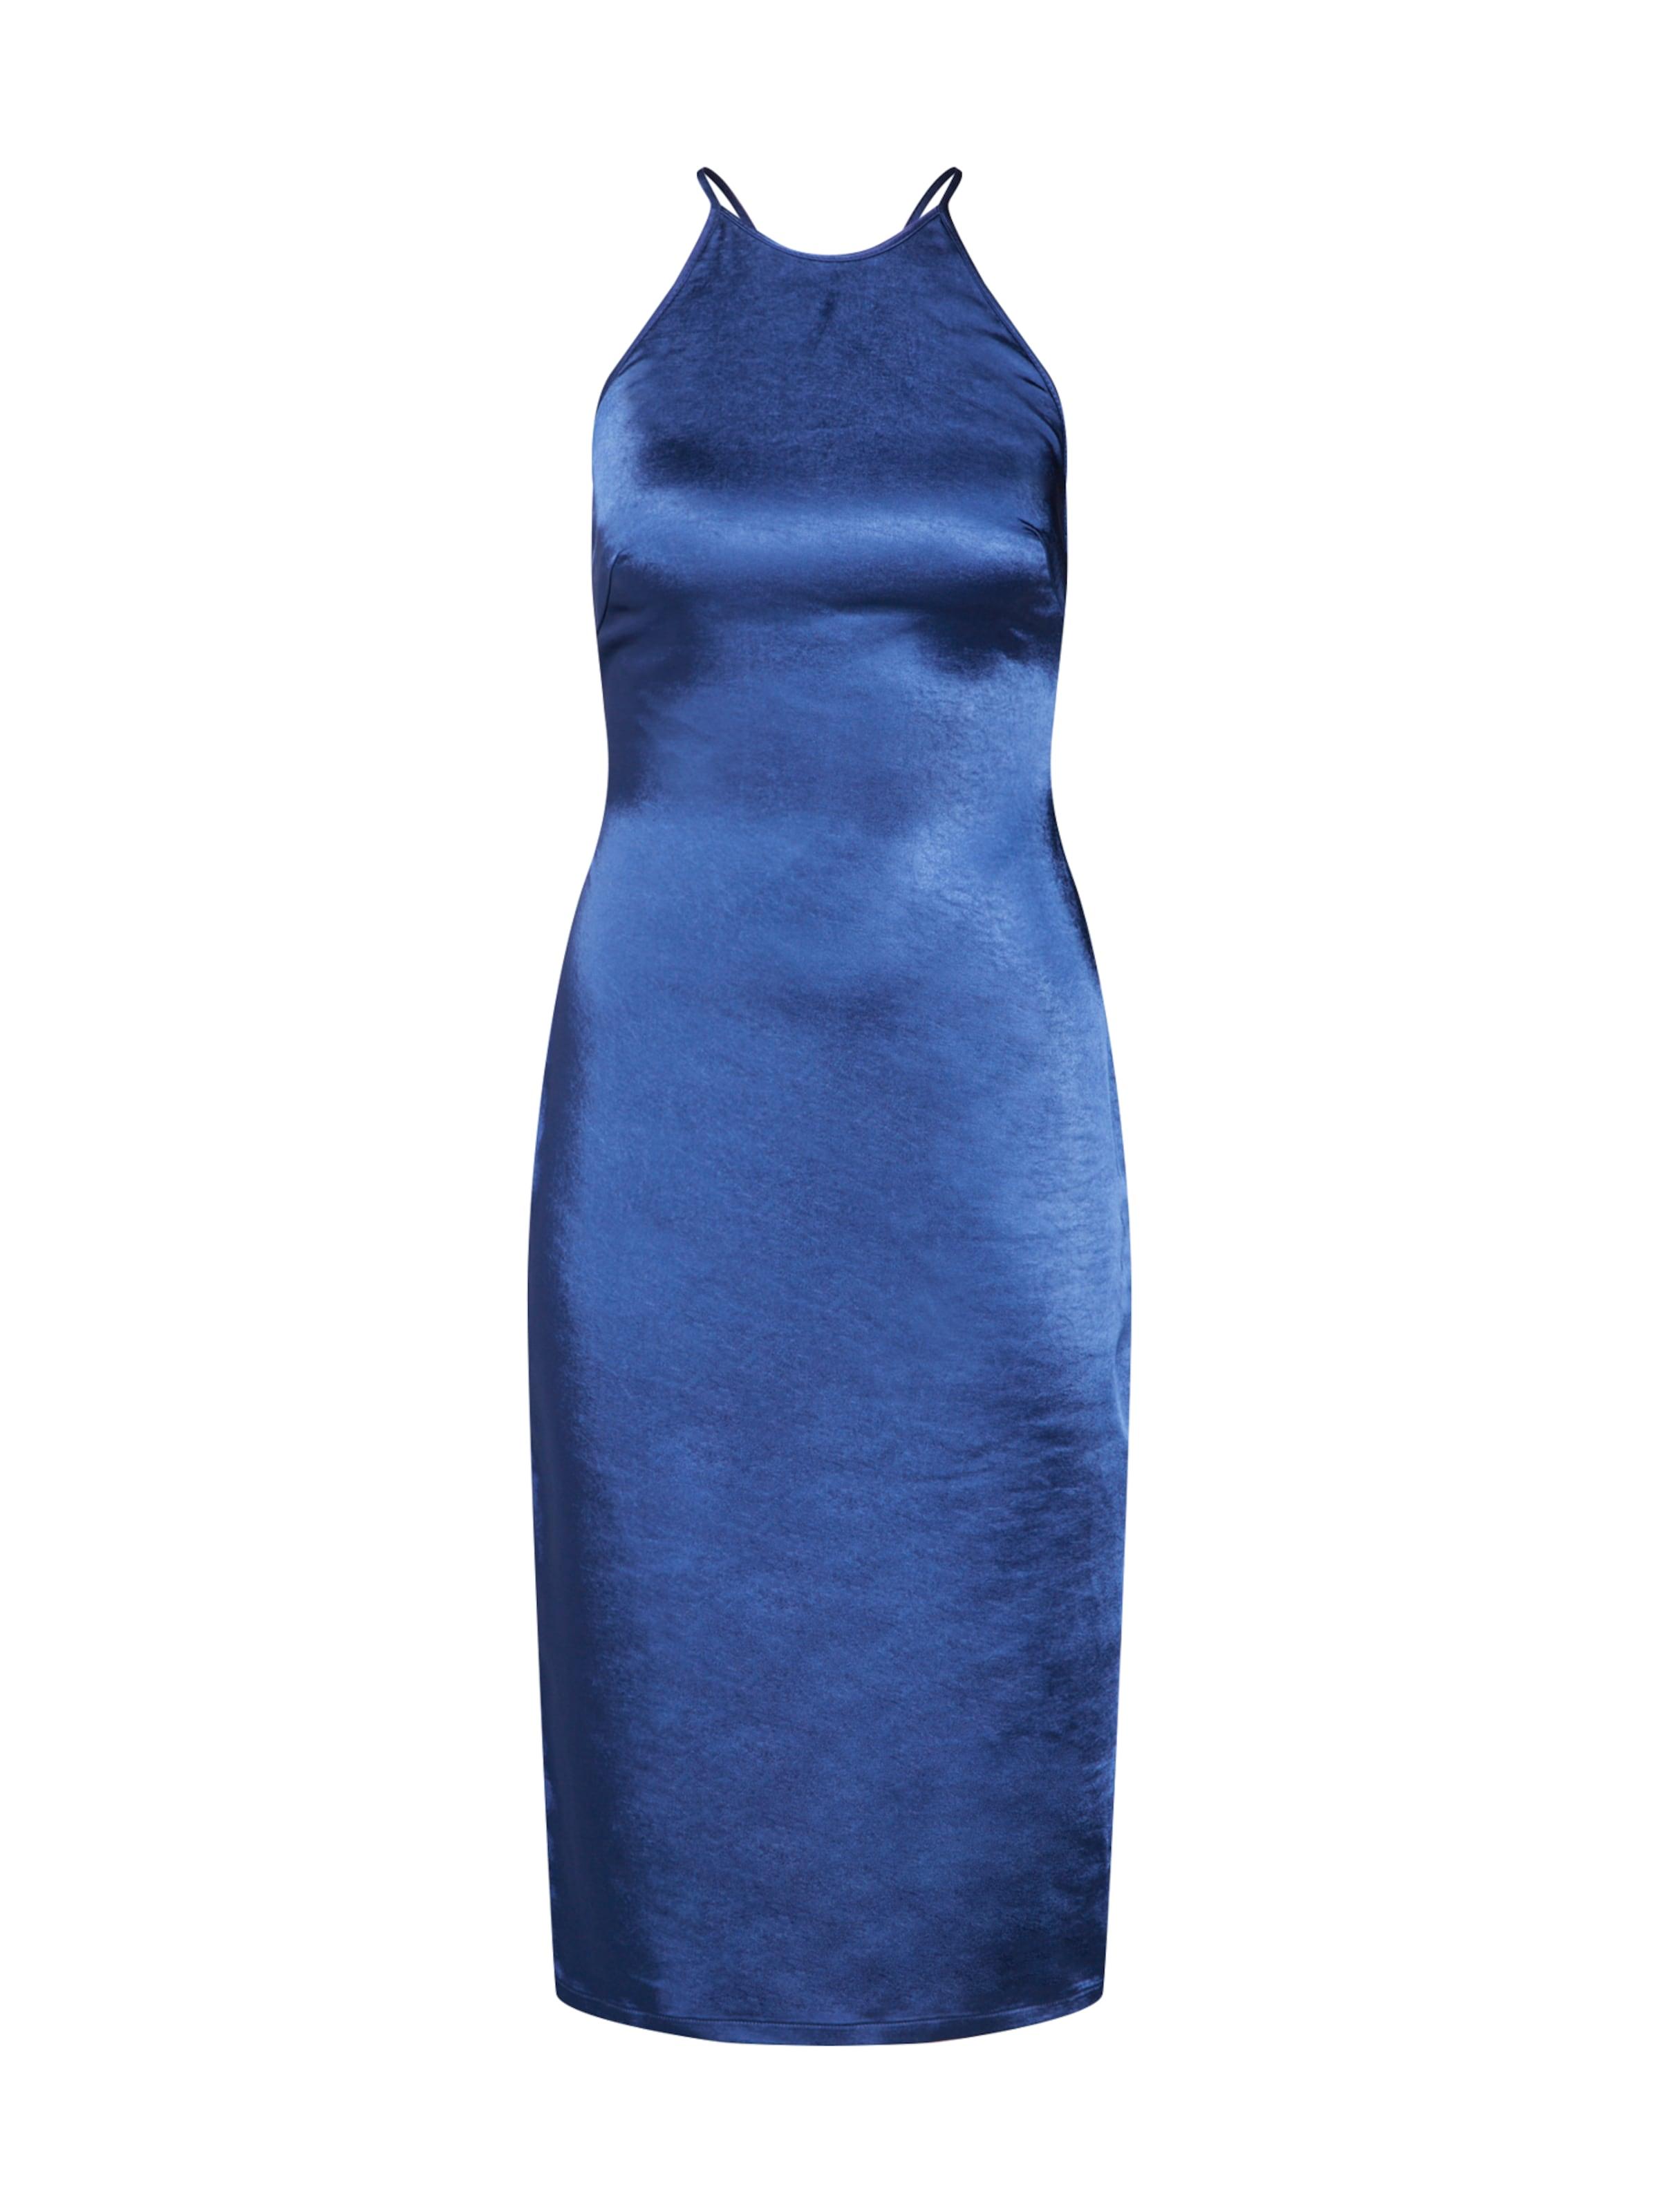 4thamp; Cocktail Reckless 'otis' De Robe En Bleu KTl1FJc